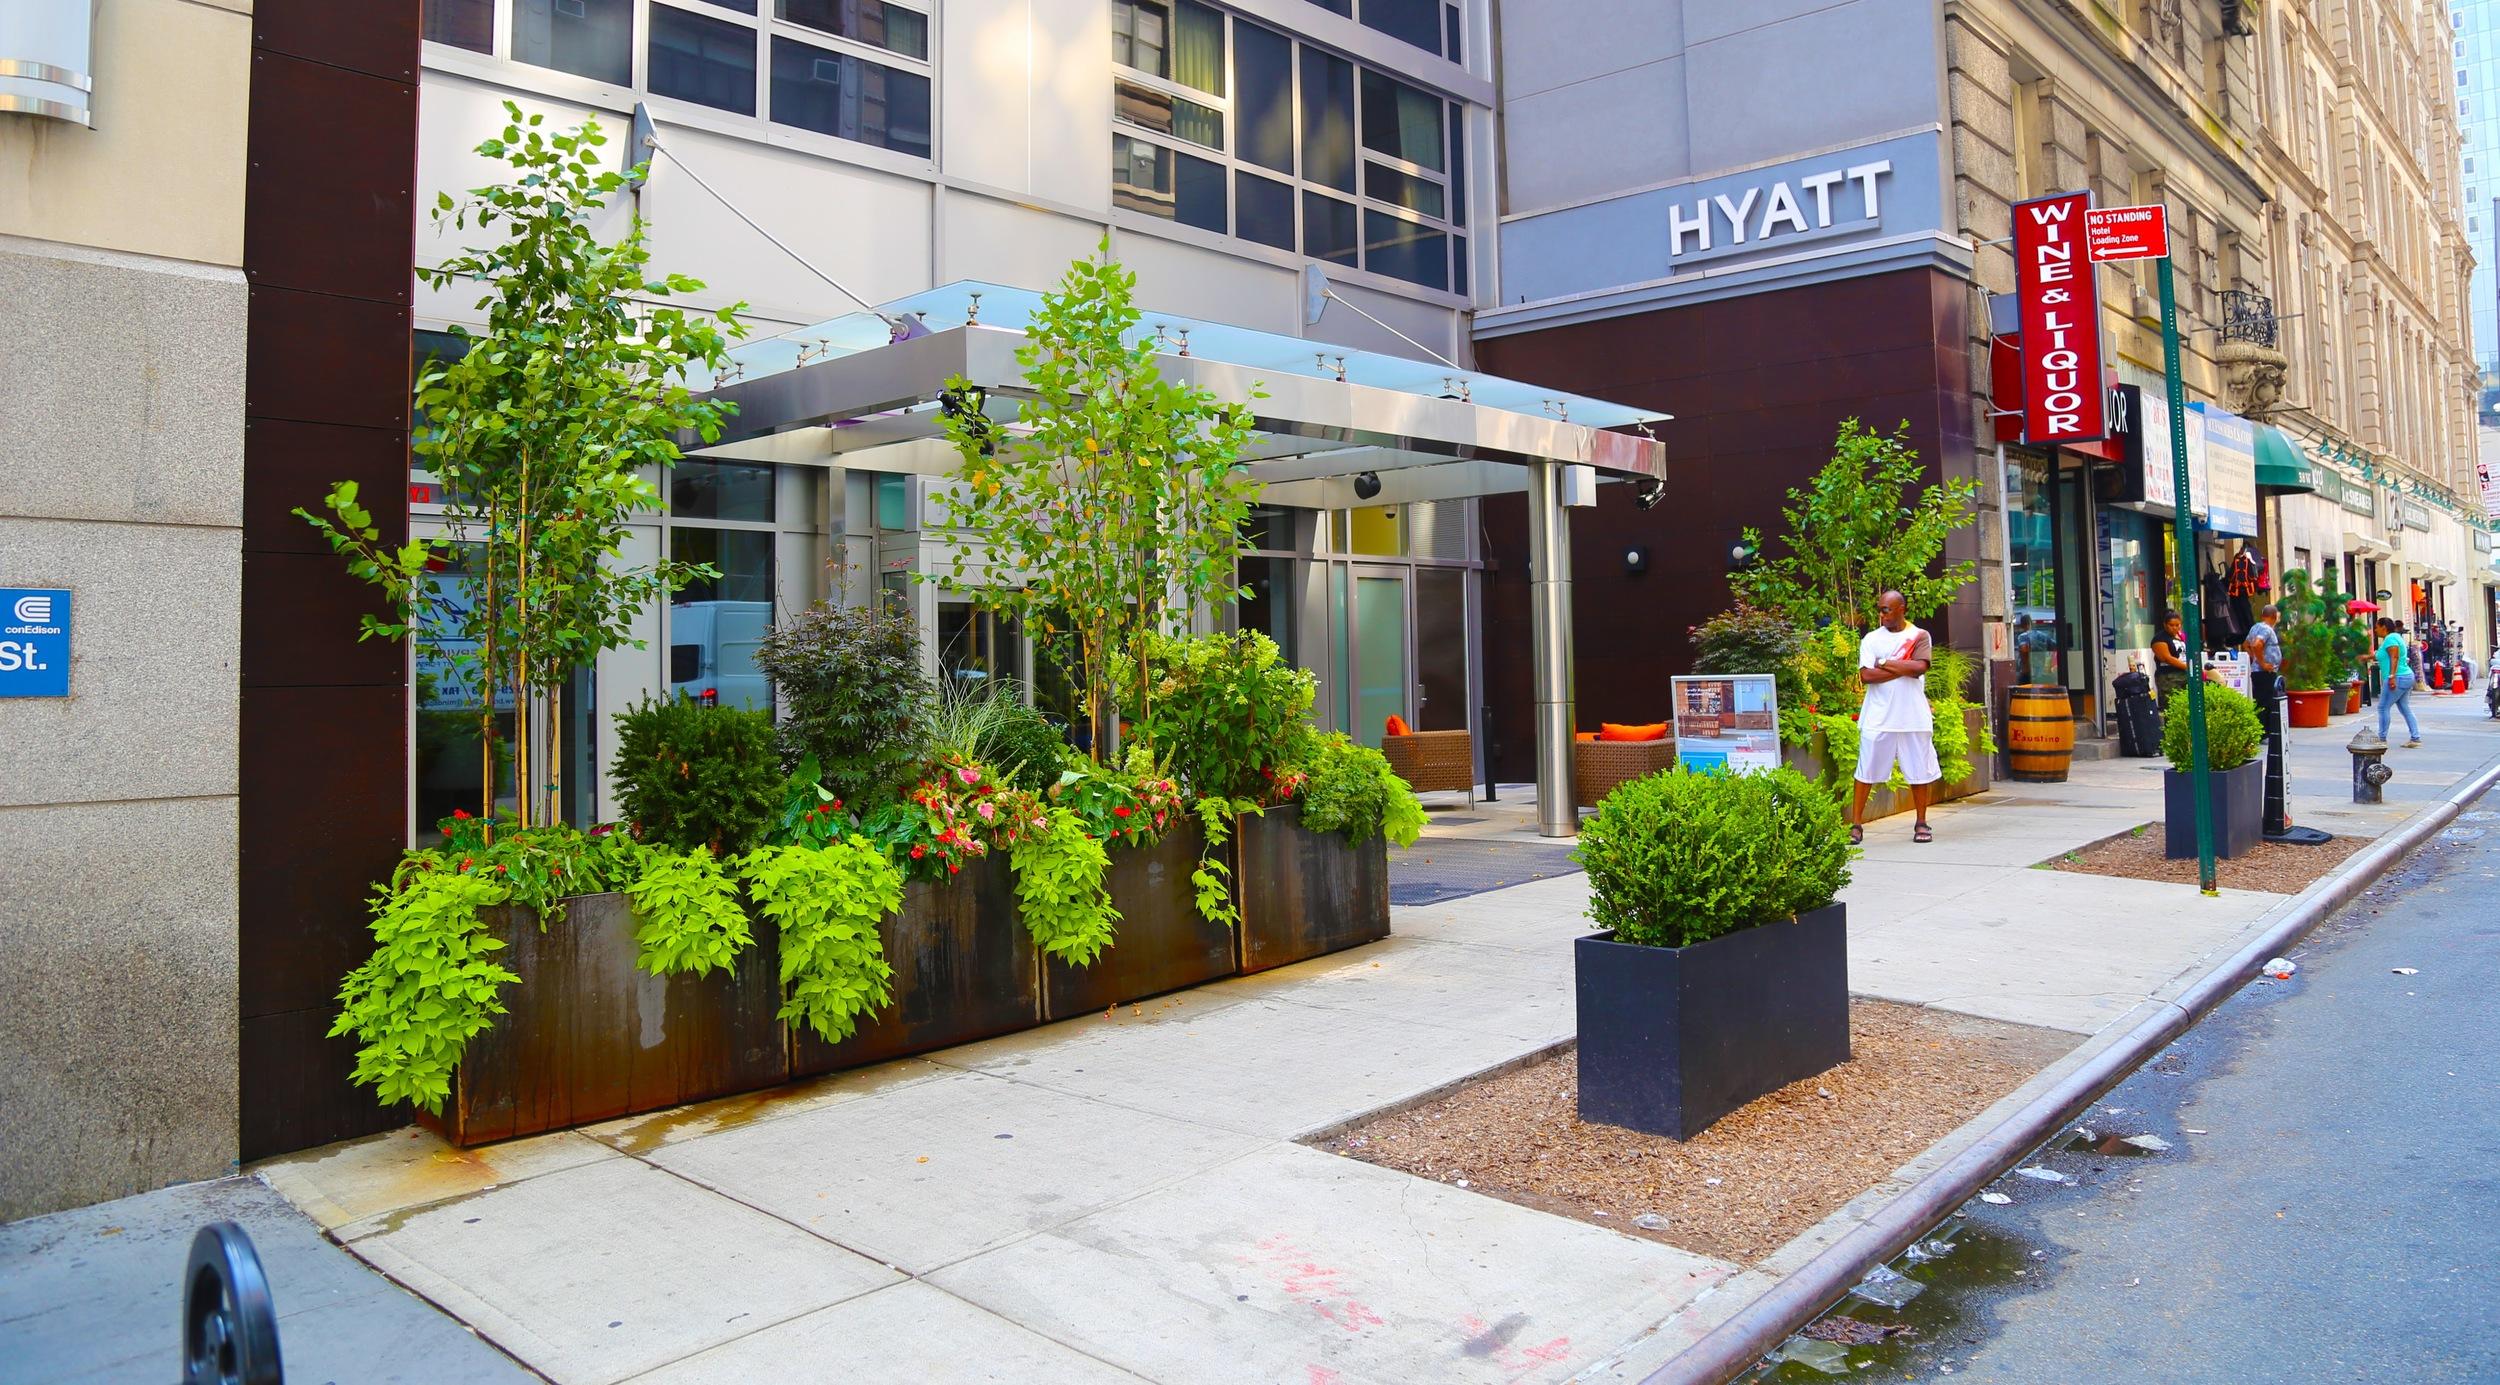 The Hyatt at Herald Square